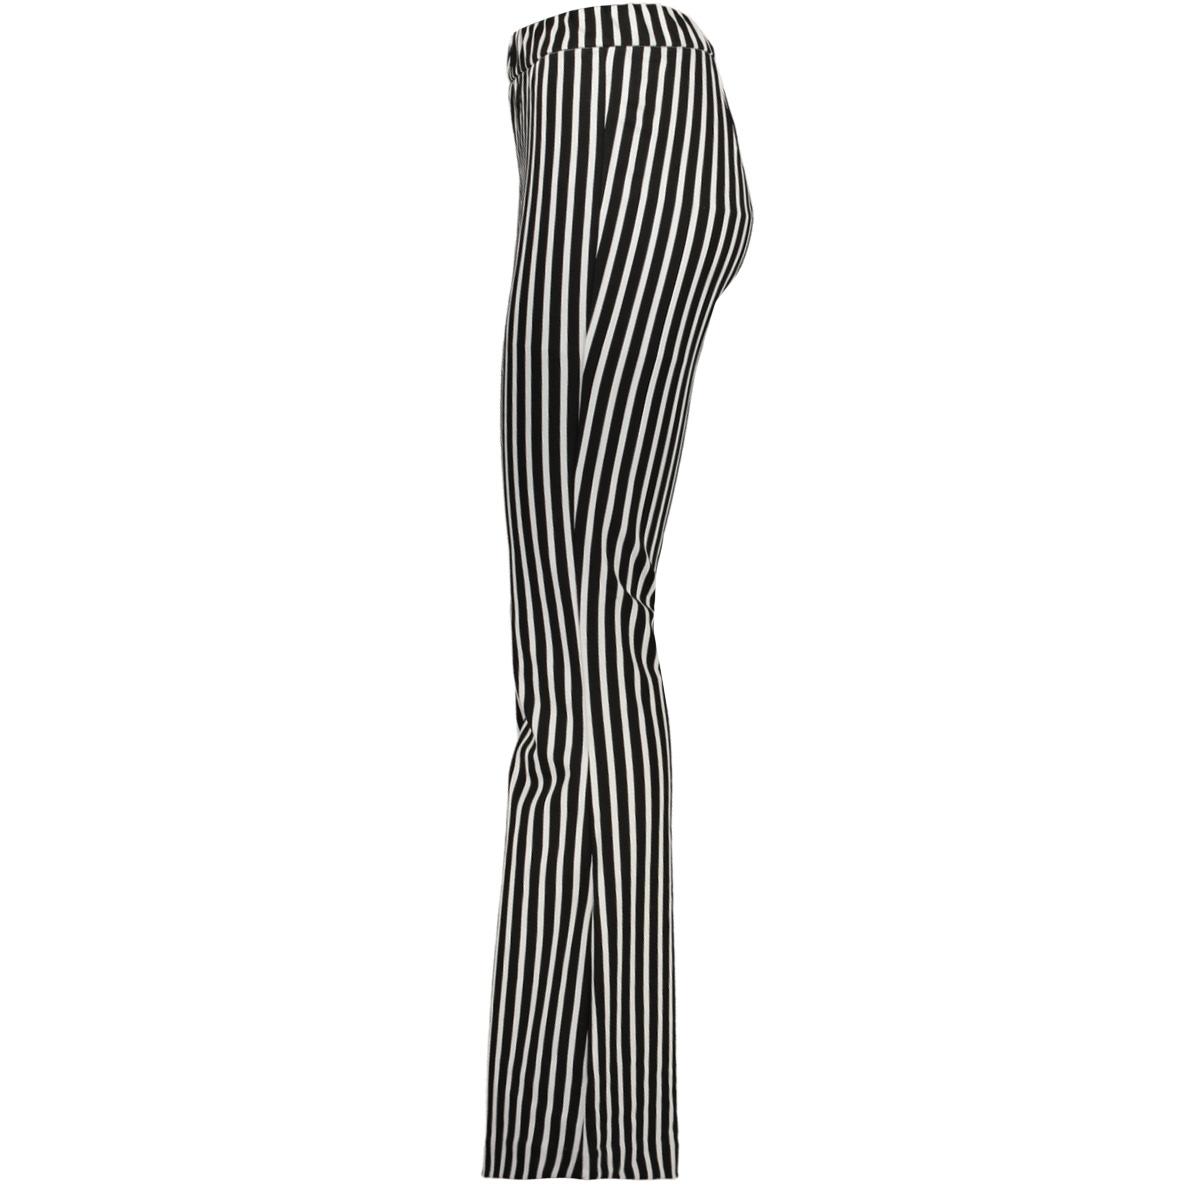 vmkamma nw flared jersey print pant 10221559 vero moda broek black/white